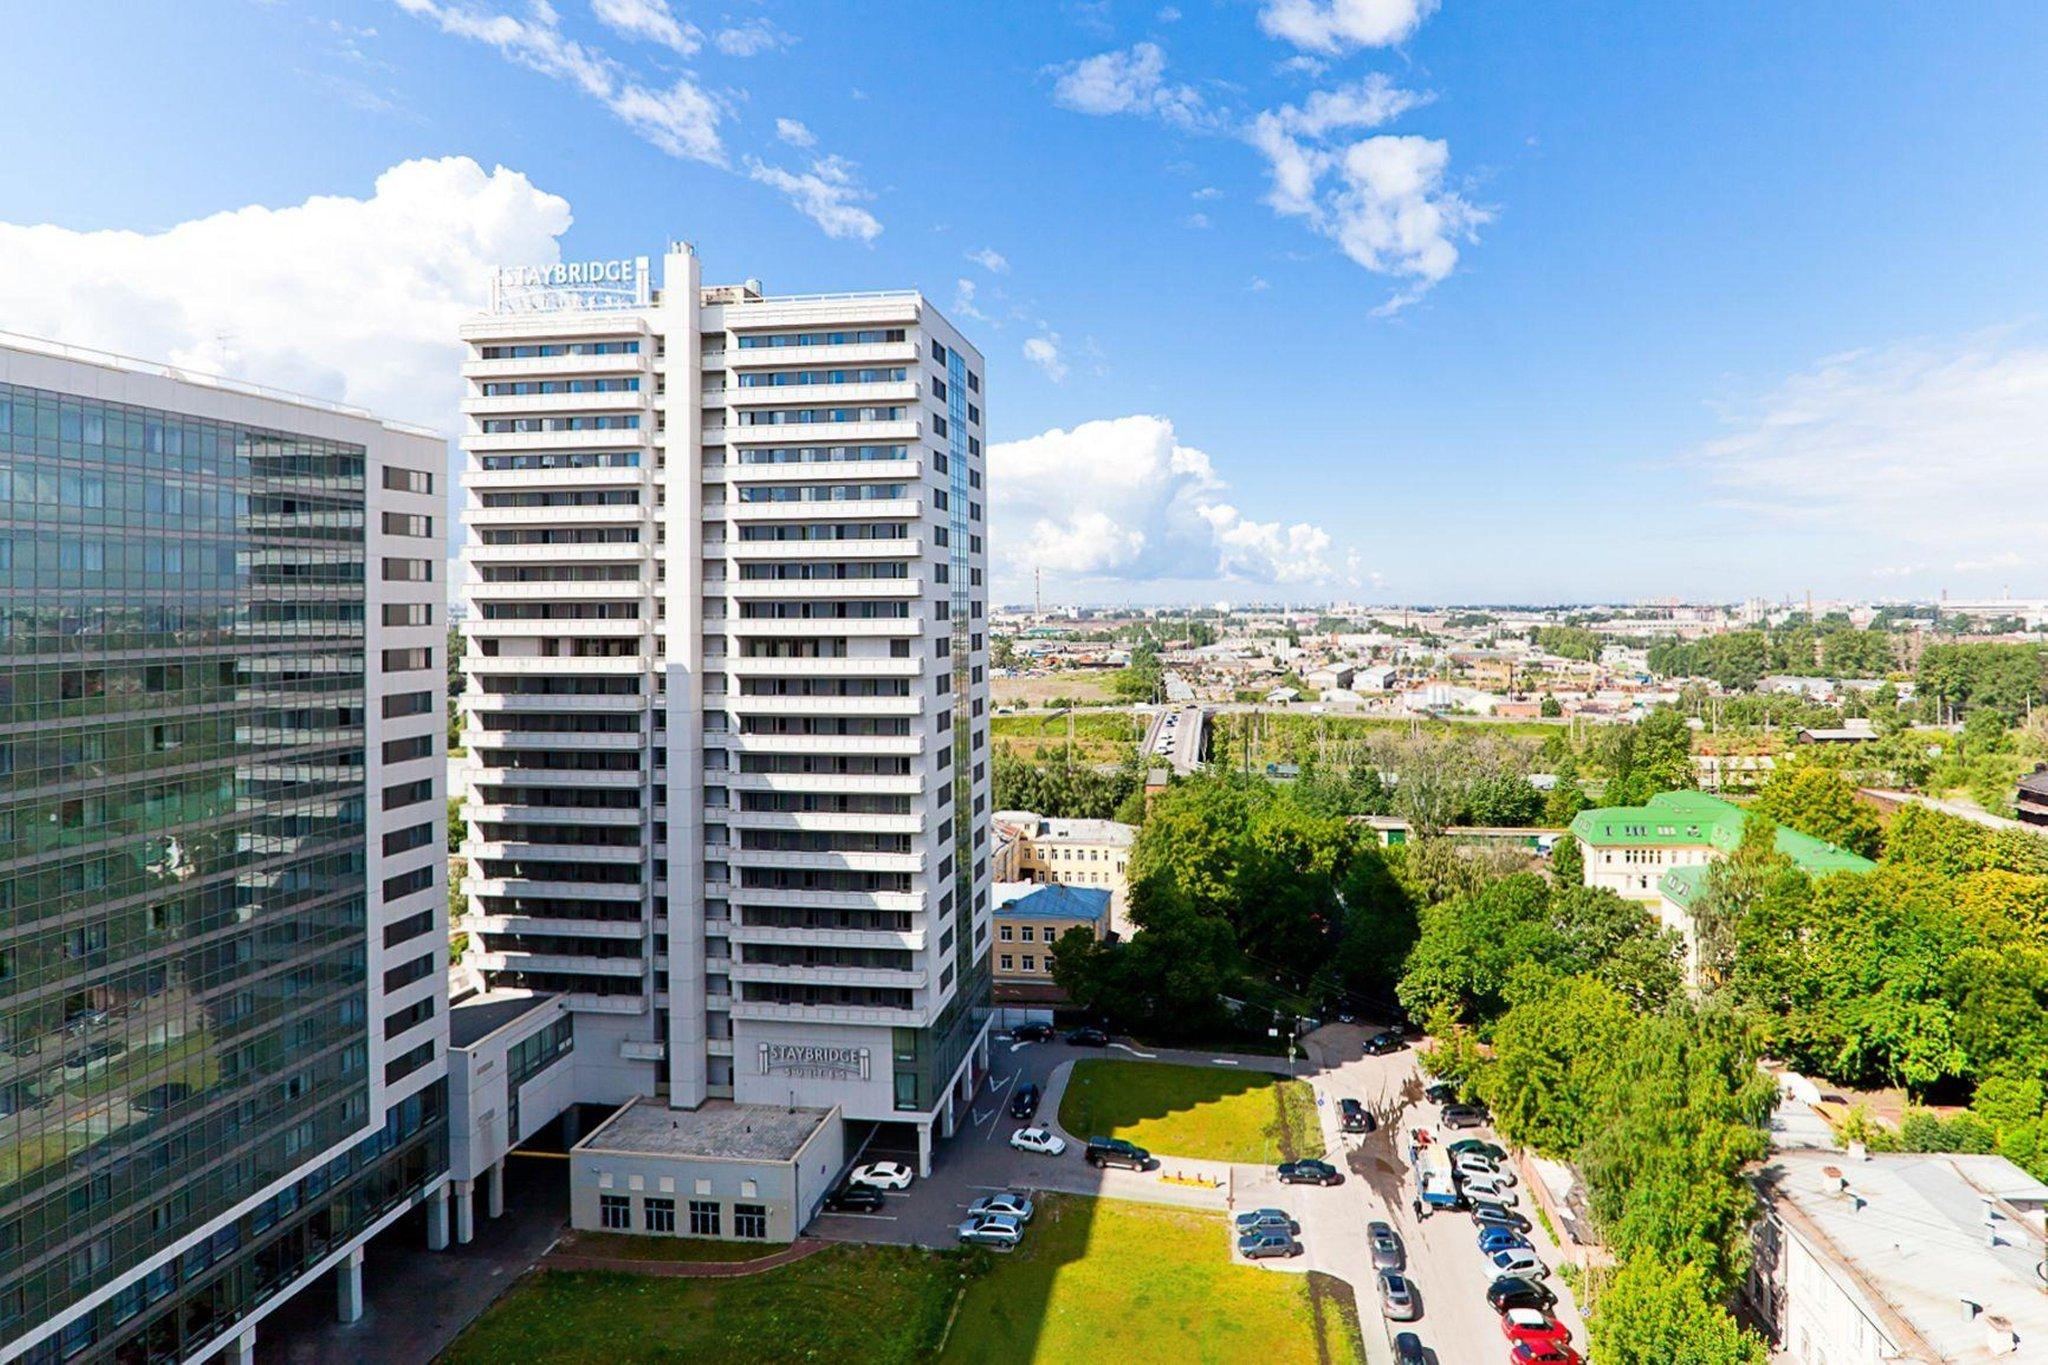 Staybridge Suites St. Petersburg